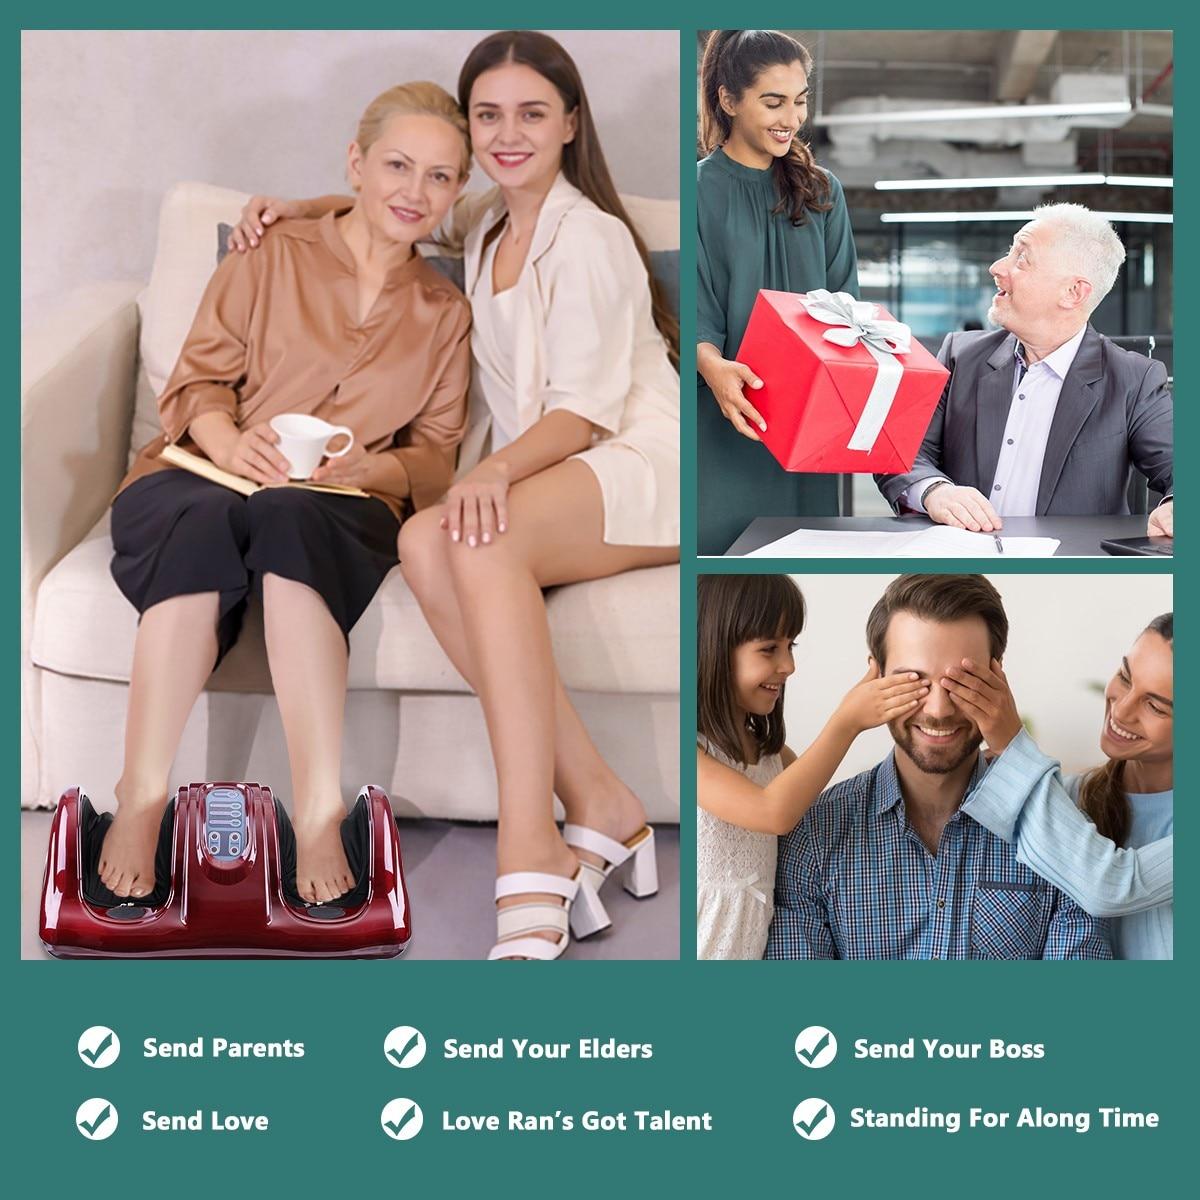 220V Electric Heating Foot Body Leg Massager Shiatsu Kneading Roller Vibrator Machine Reflexology Calf Leg Pain Relief Relax enlarge